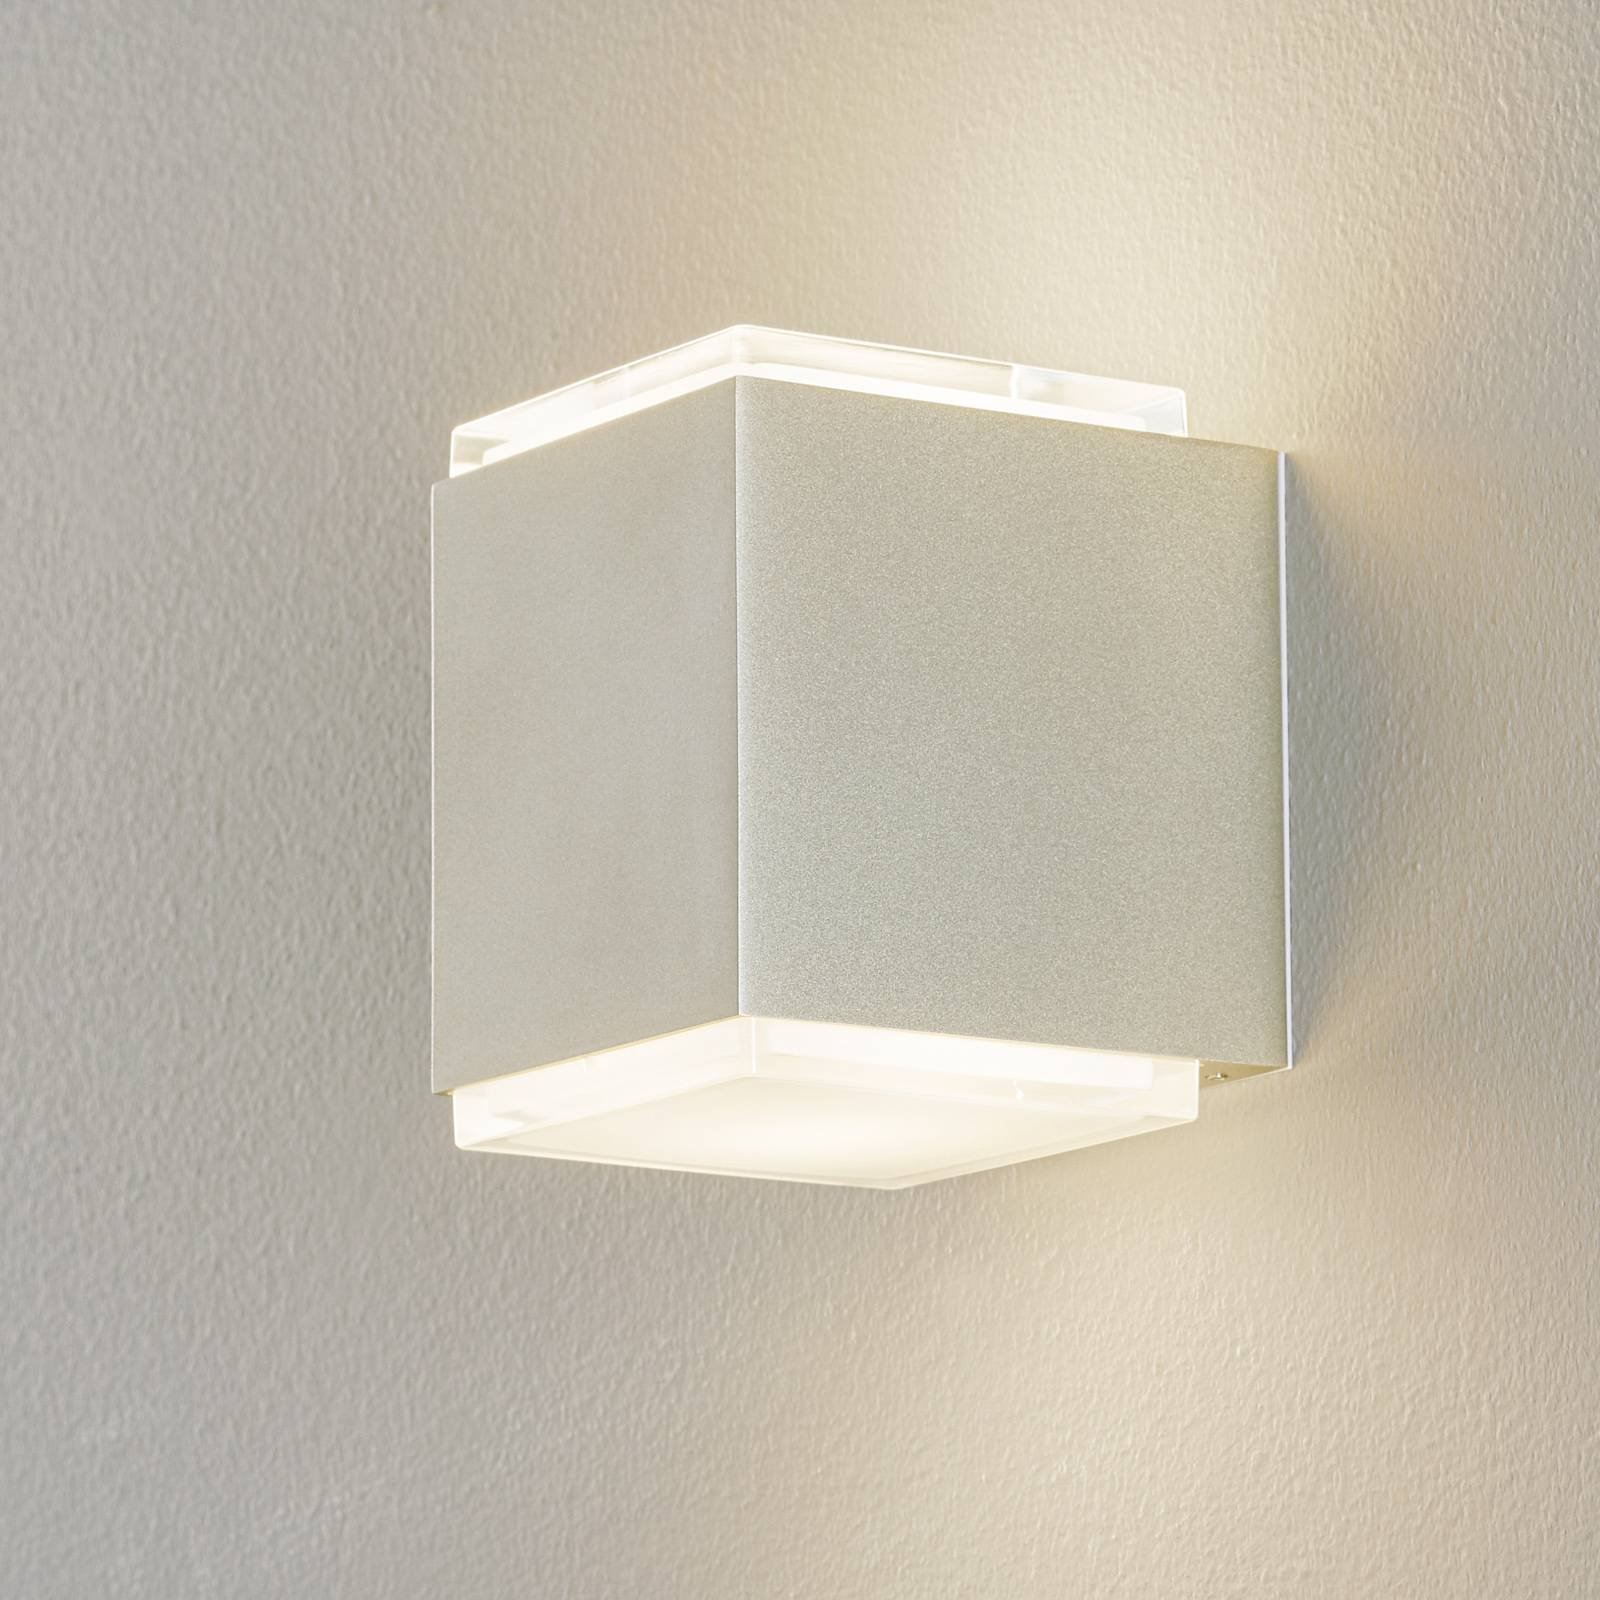 BEGA 50064 LED-vegglampe 3000K 12cm DALI-palladium